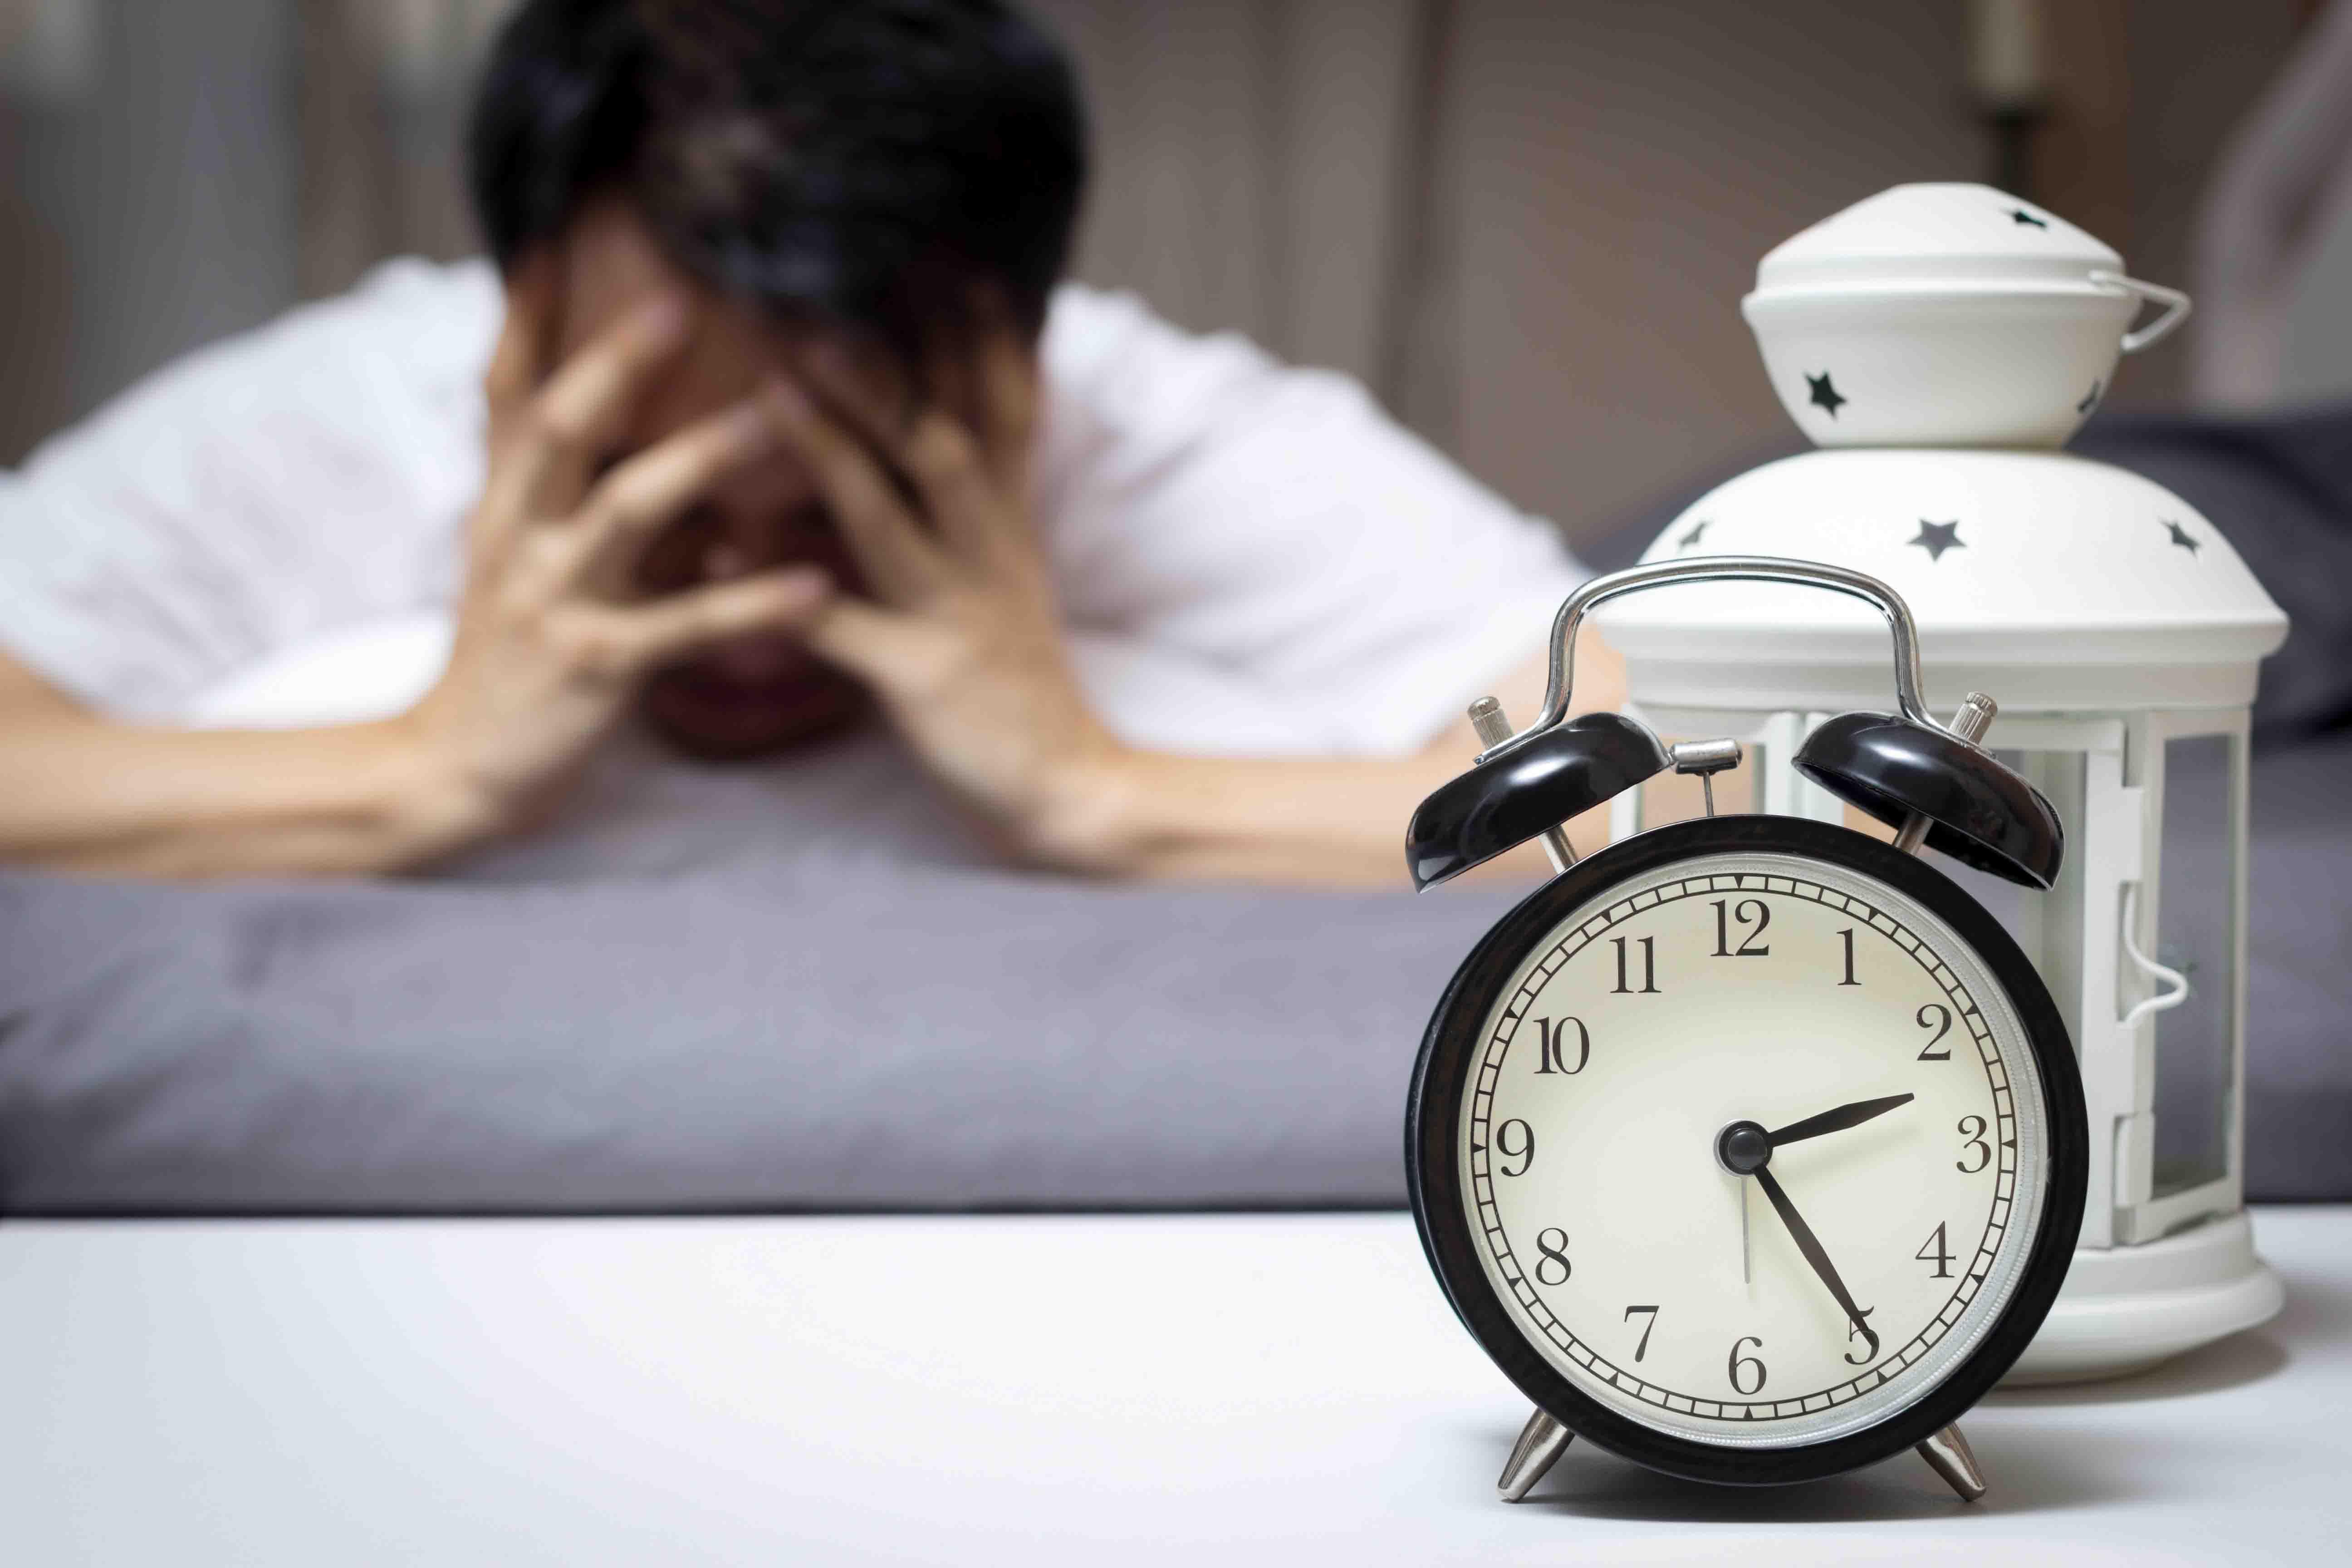 9-Simple-Hacks-For-Better-Sleep